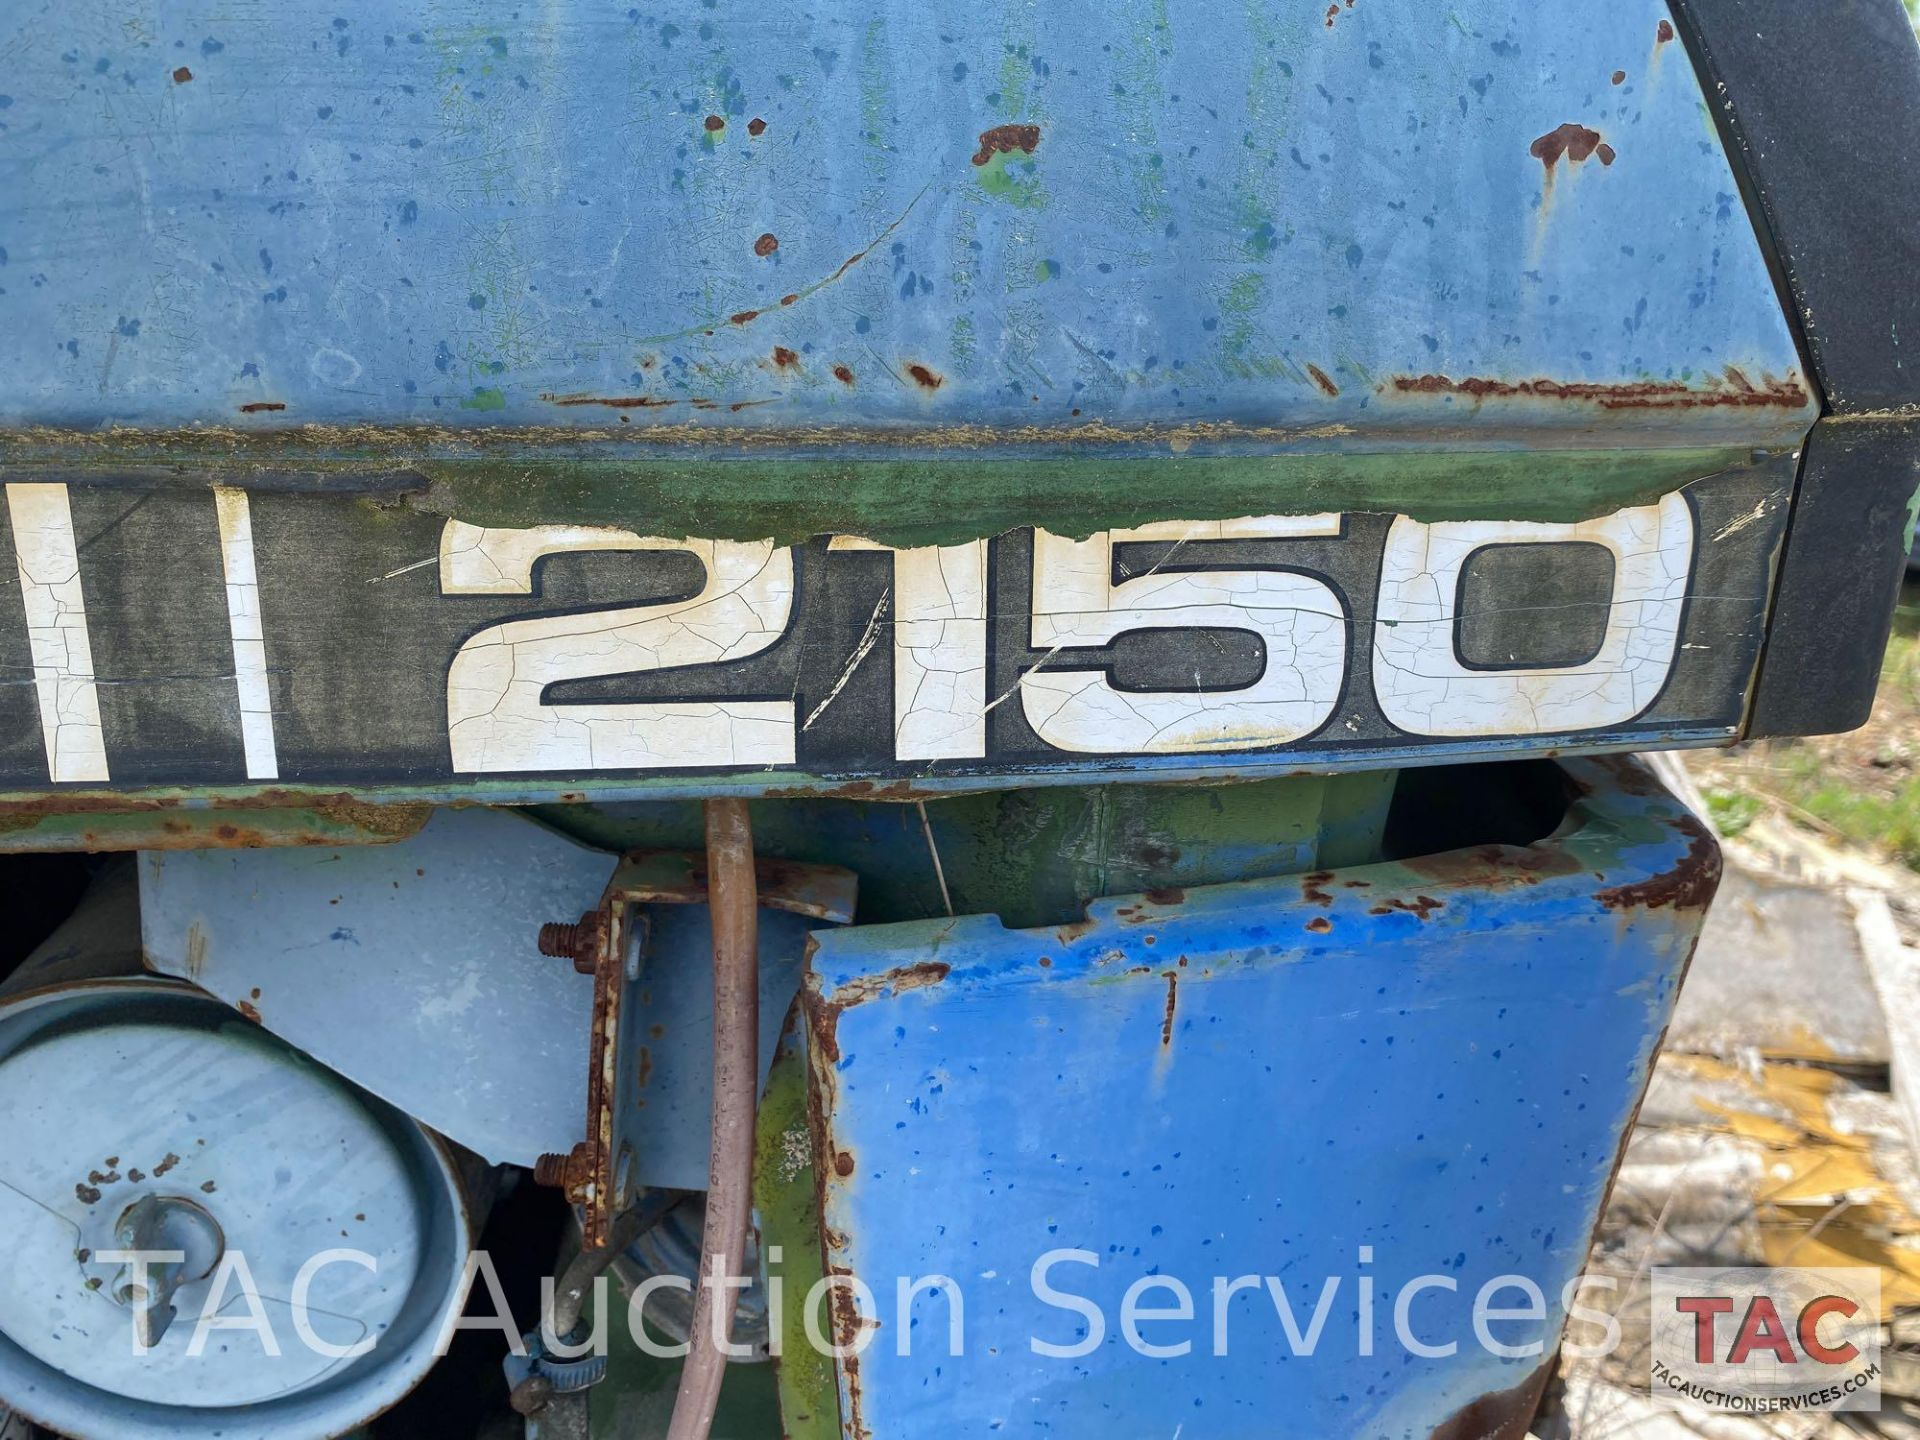 John Deere 2150 Farm Tractor - Image 8 of 34